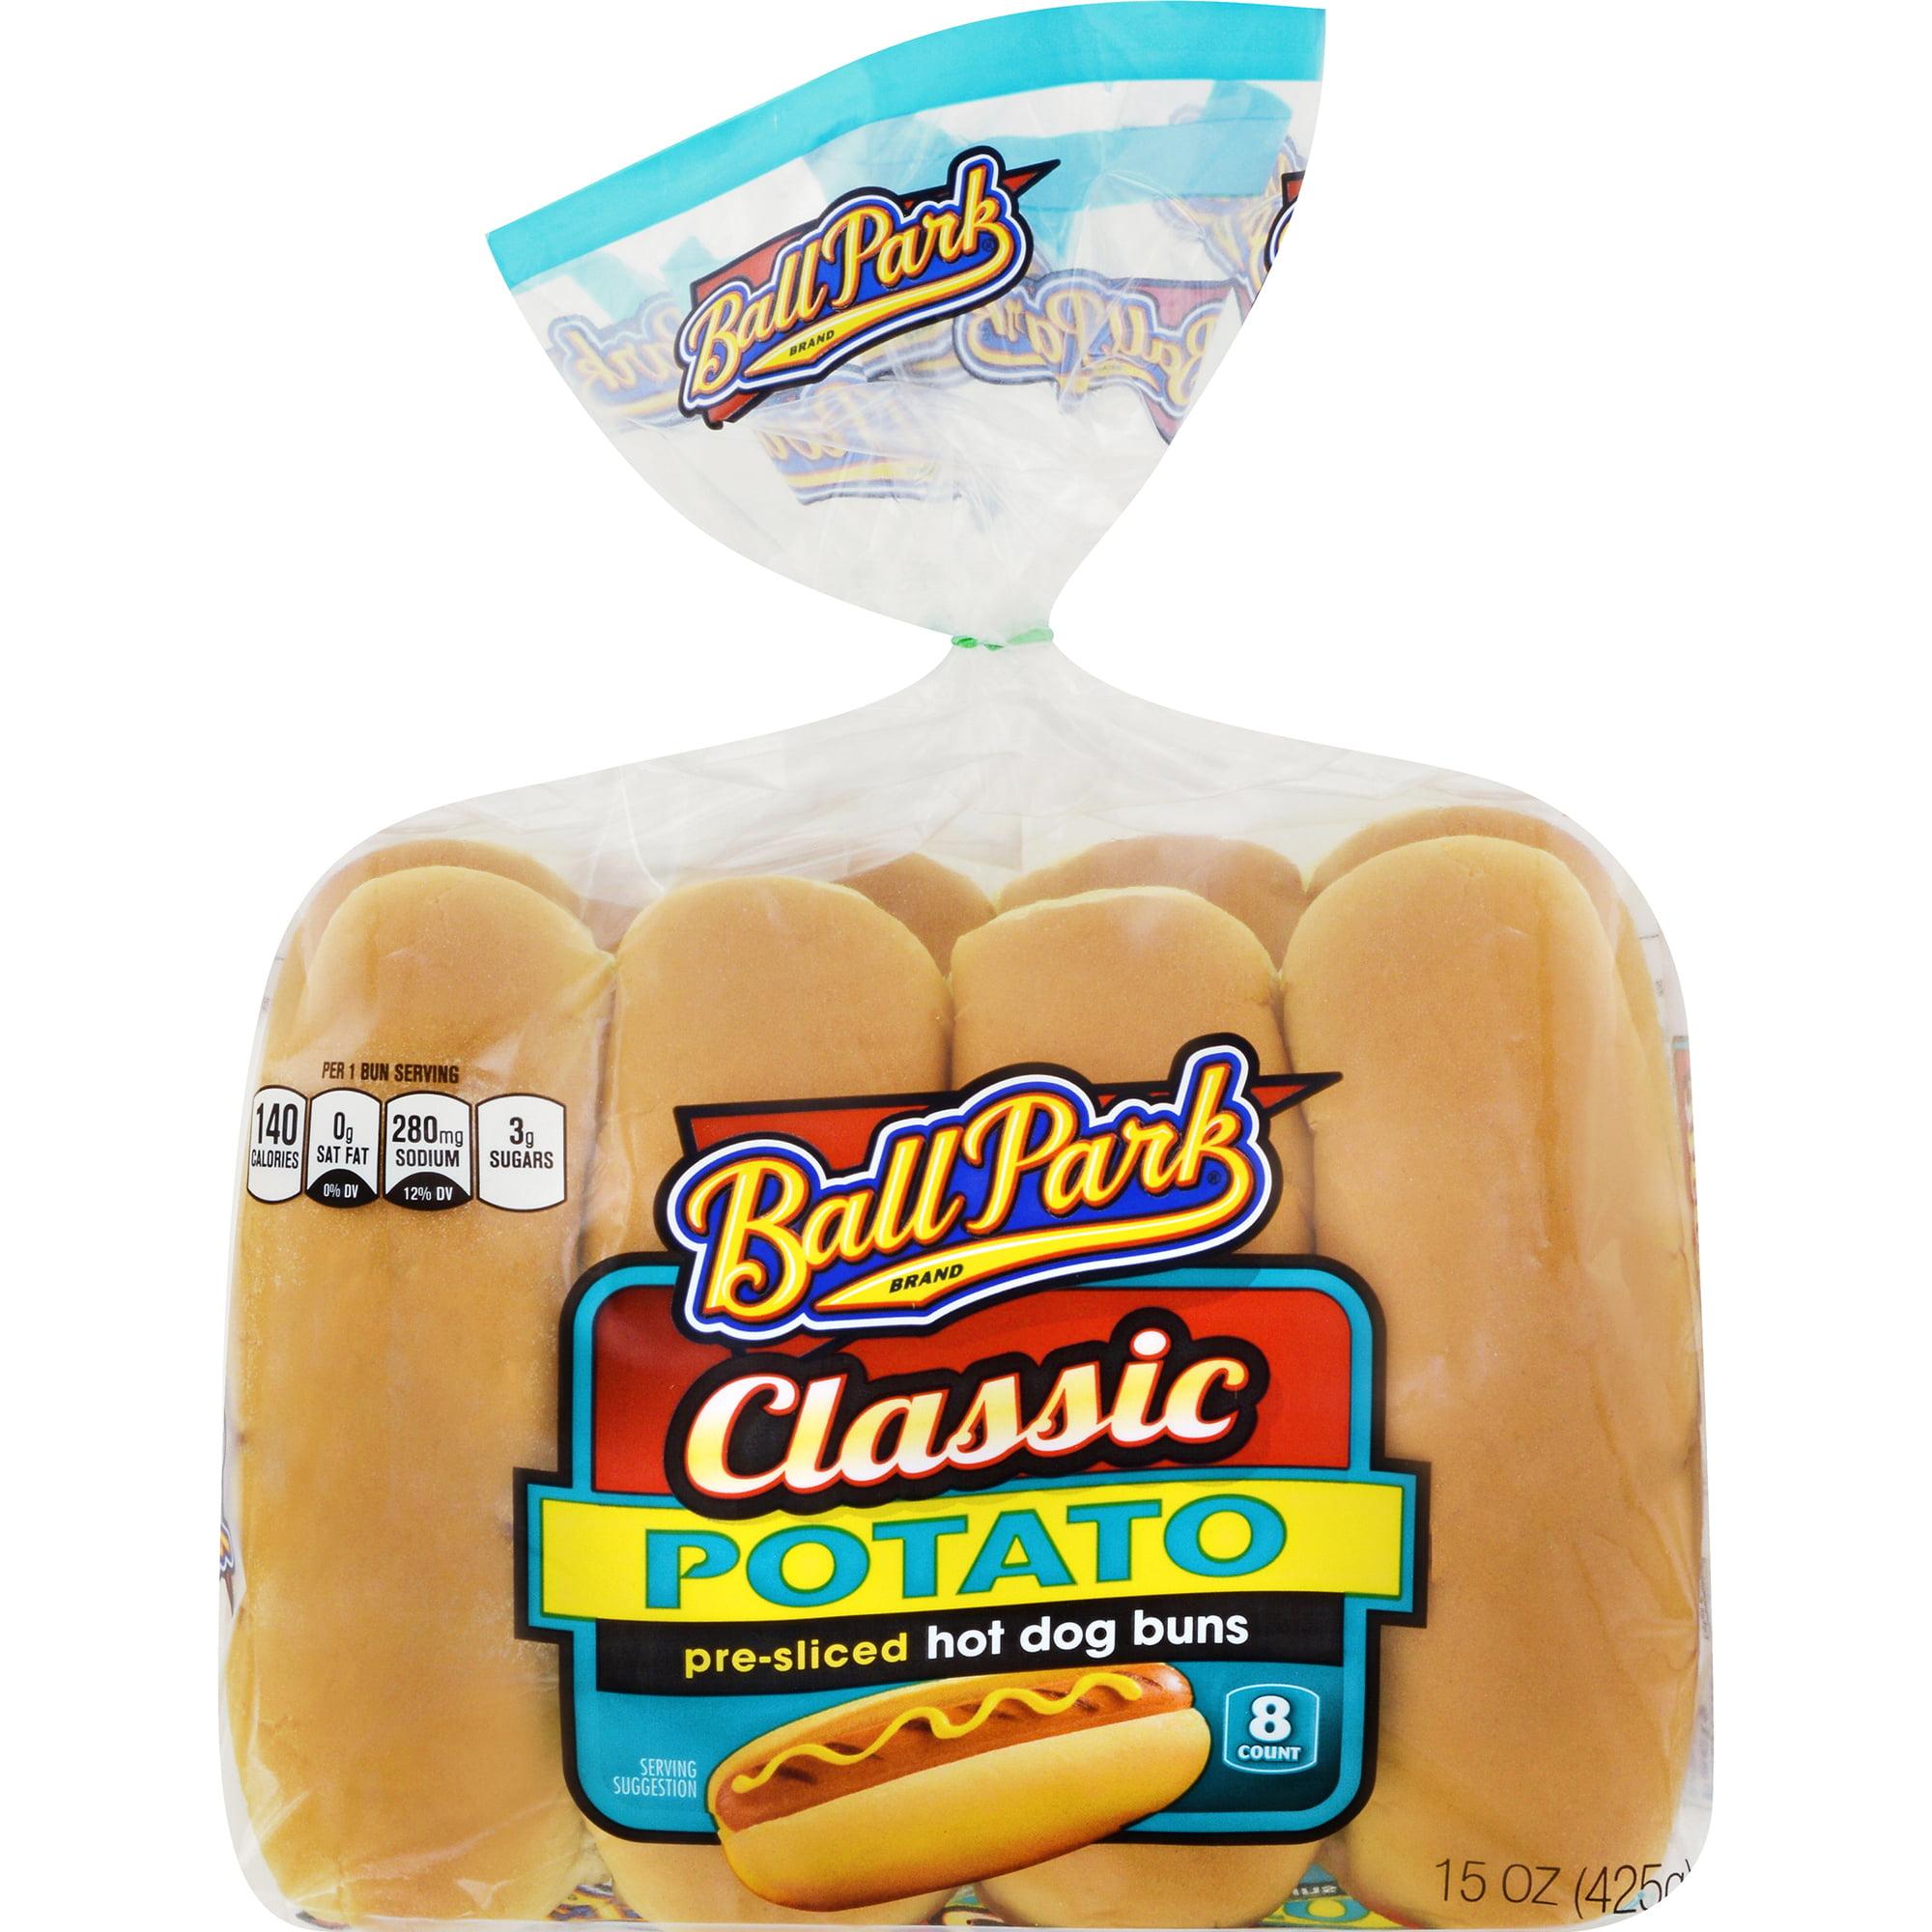 Bunny Original White Hot Dog Buns, 8 ct, 12 oz. - Walmart